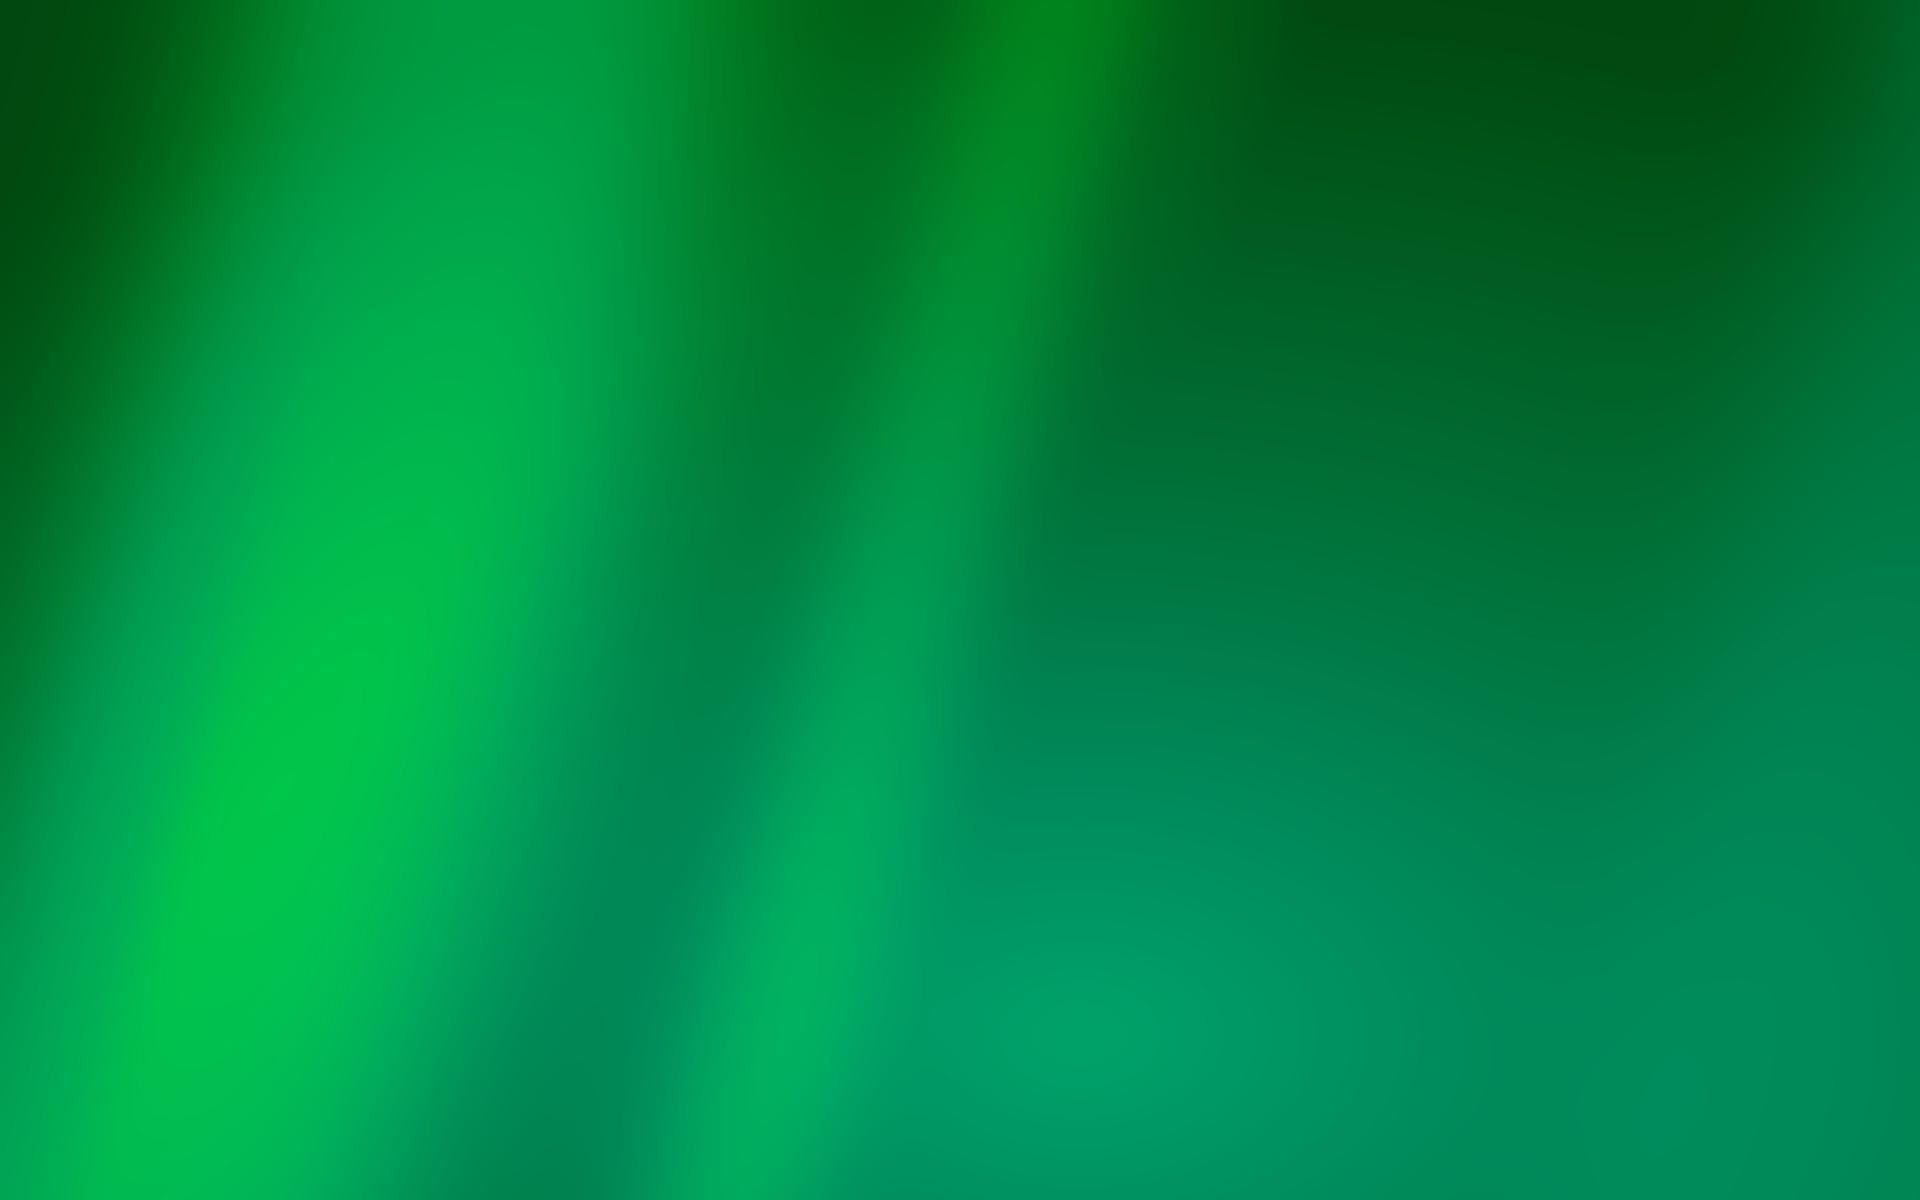 default-wallpaper-abstract.png (PNG Image, 1920 x 1200 pixels)